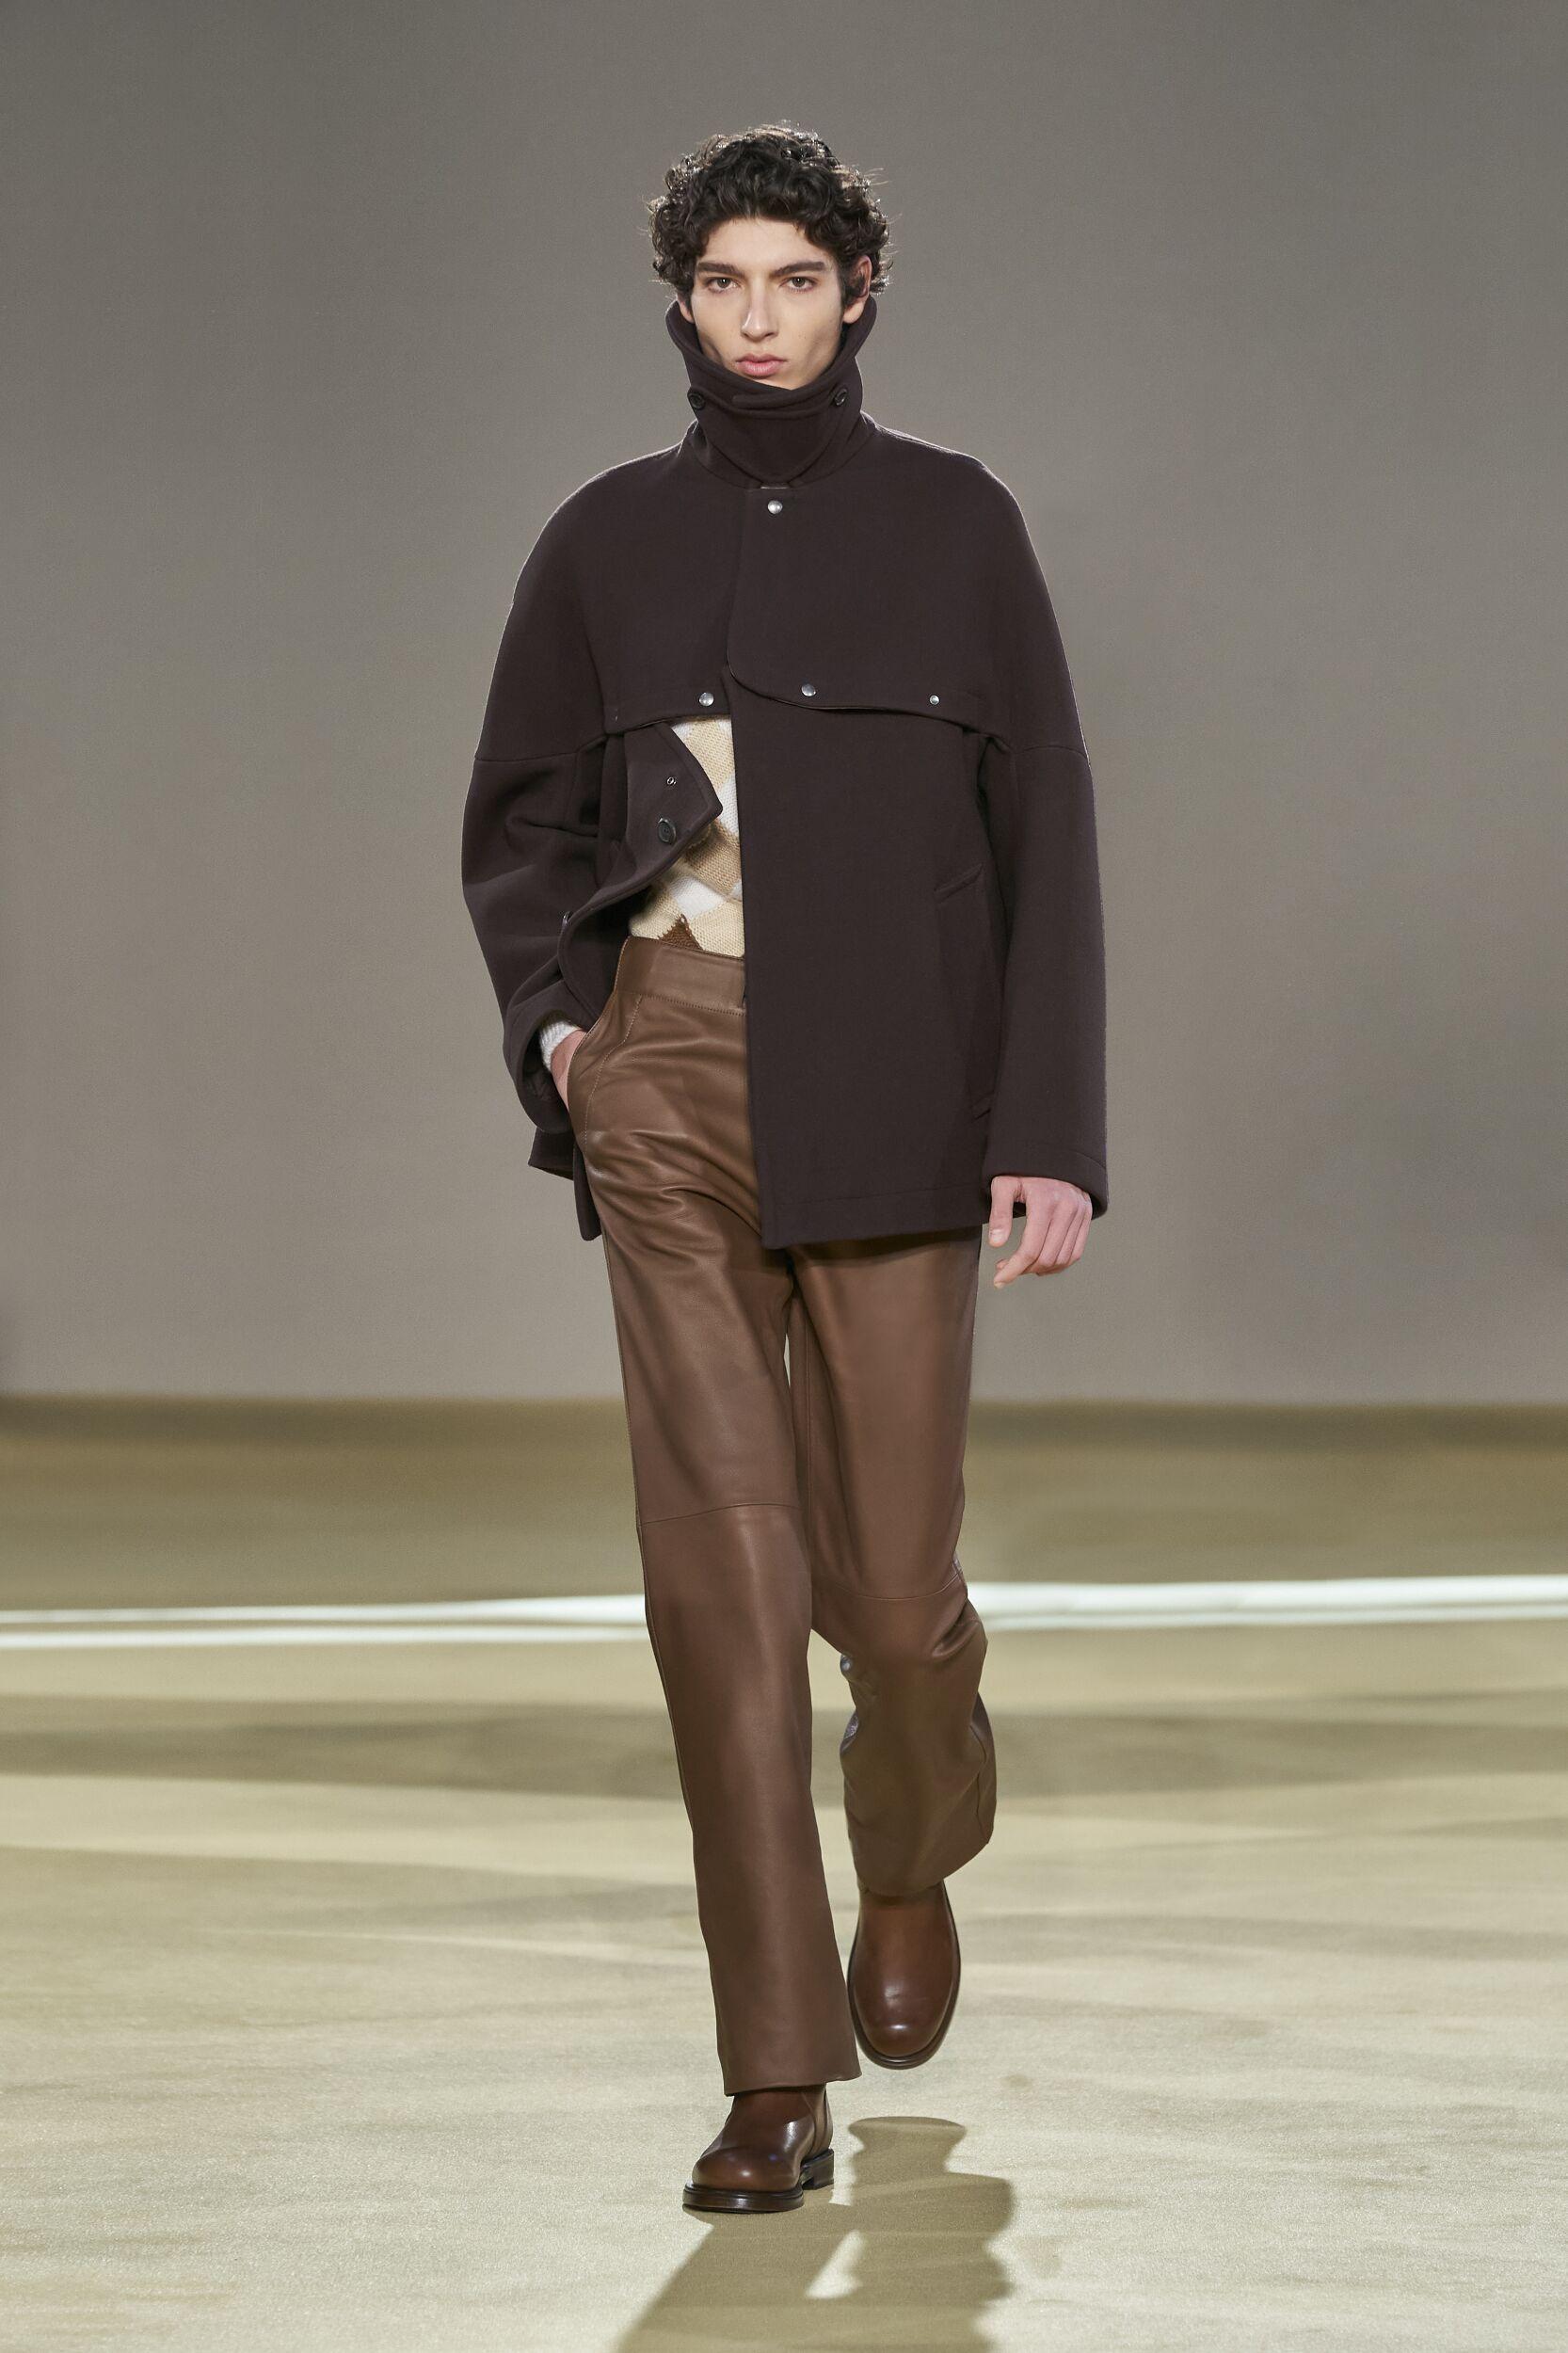 Winter 2020 Man Trends Salvatore Ferragamo